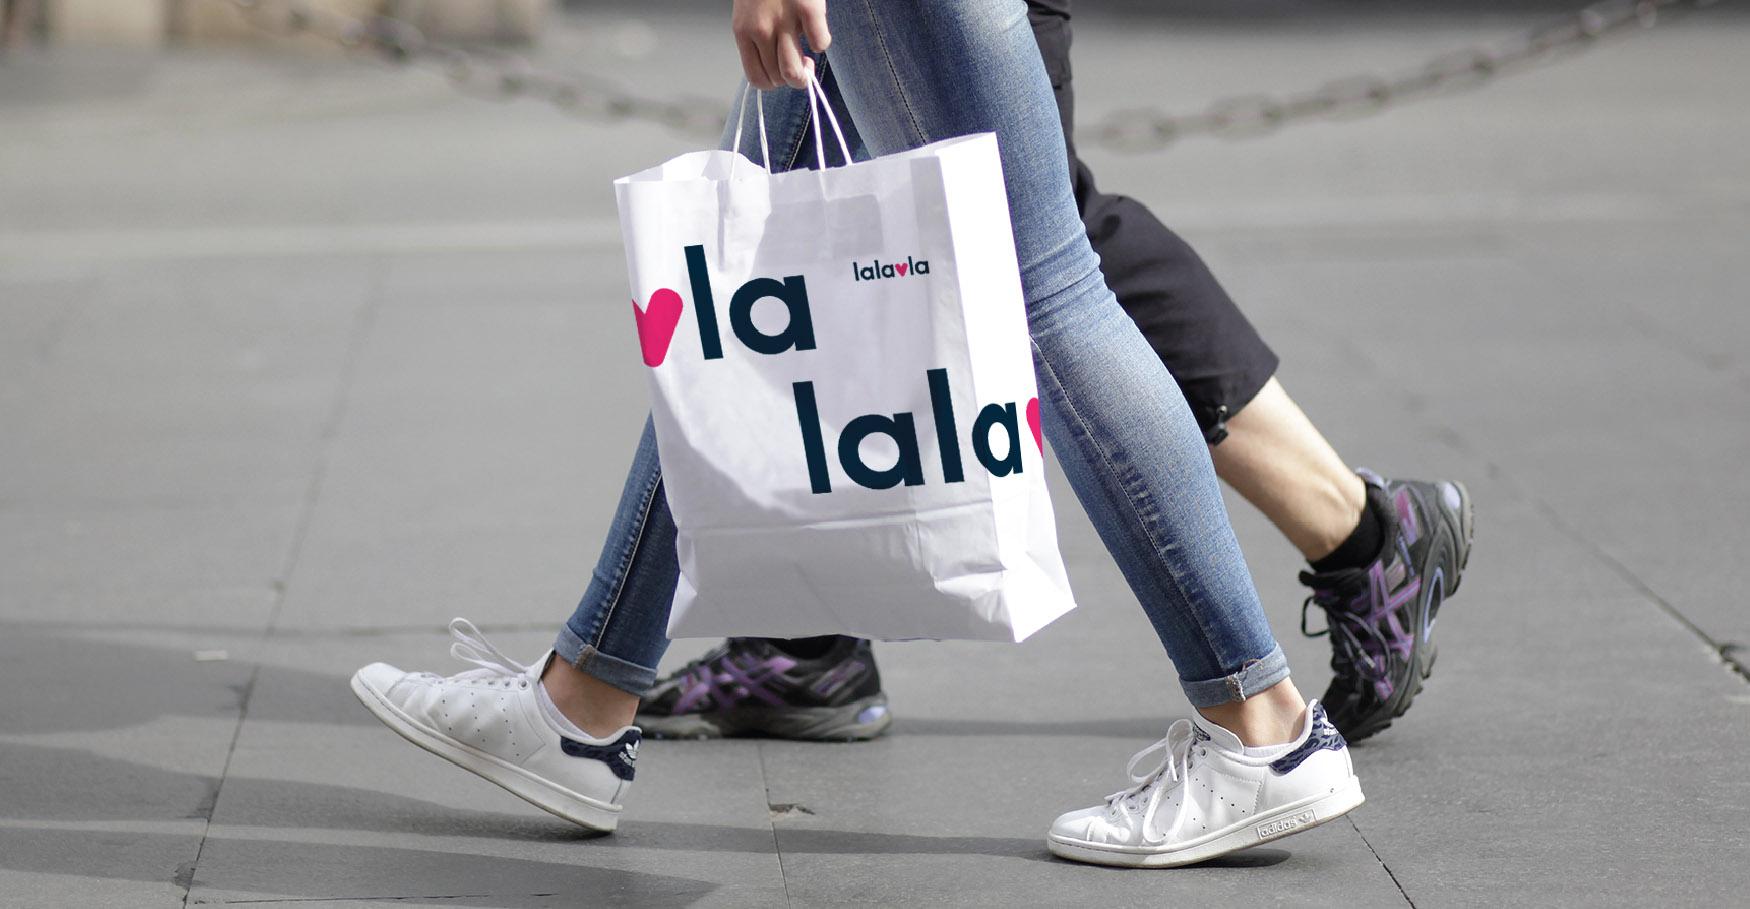 lala02.jpg